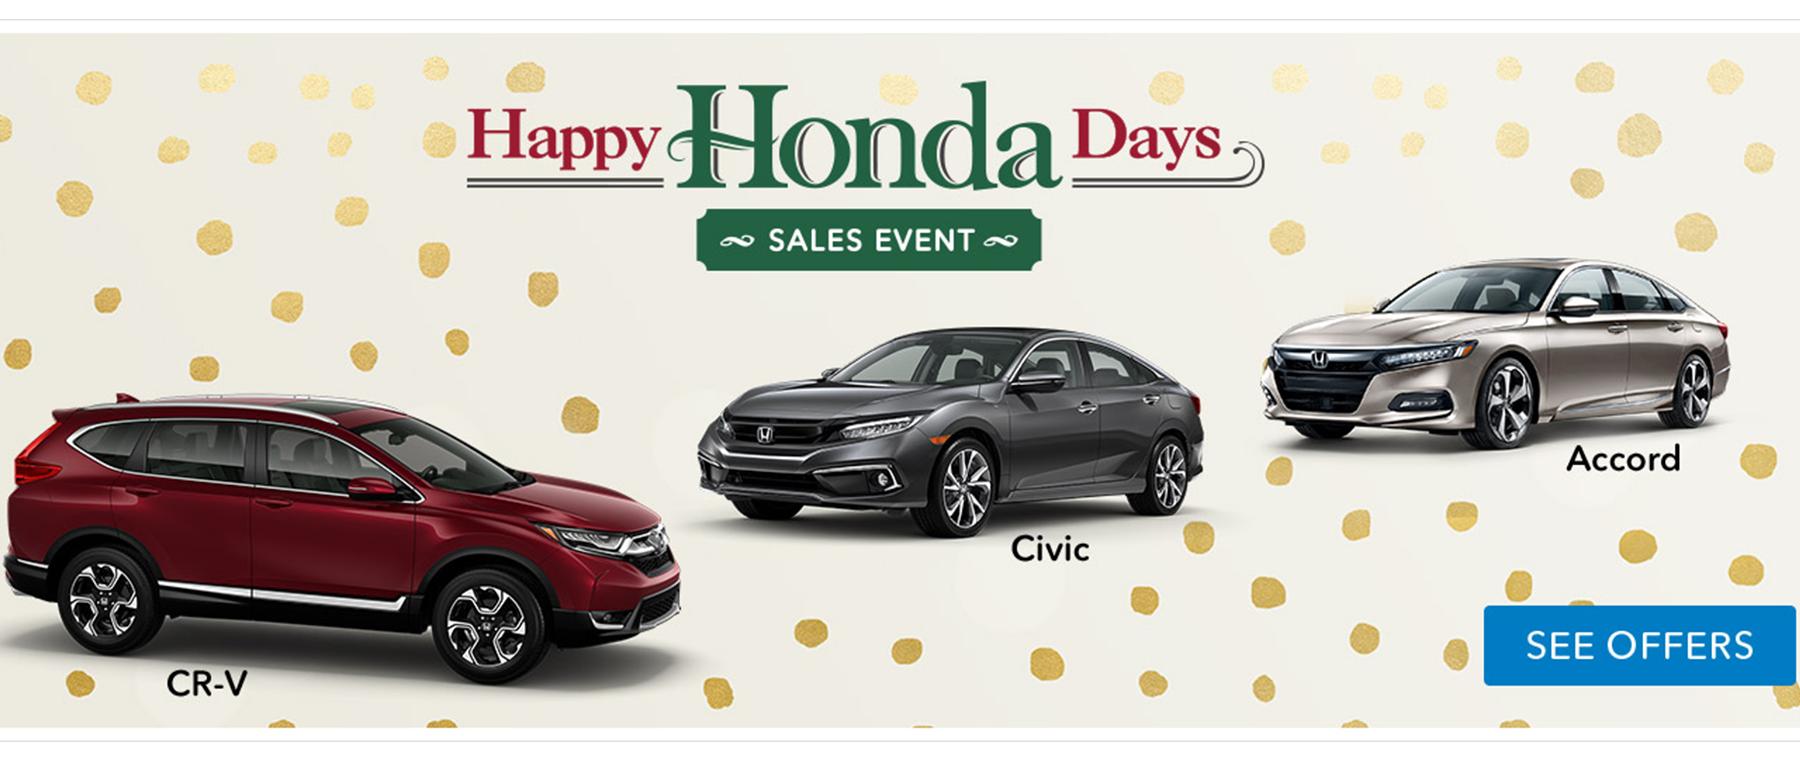 Happy Honda Days